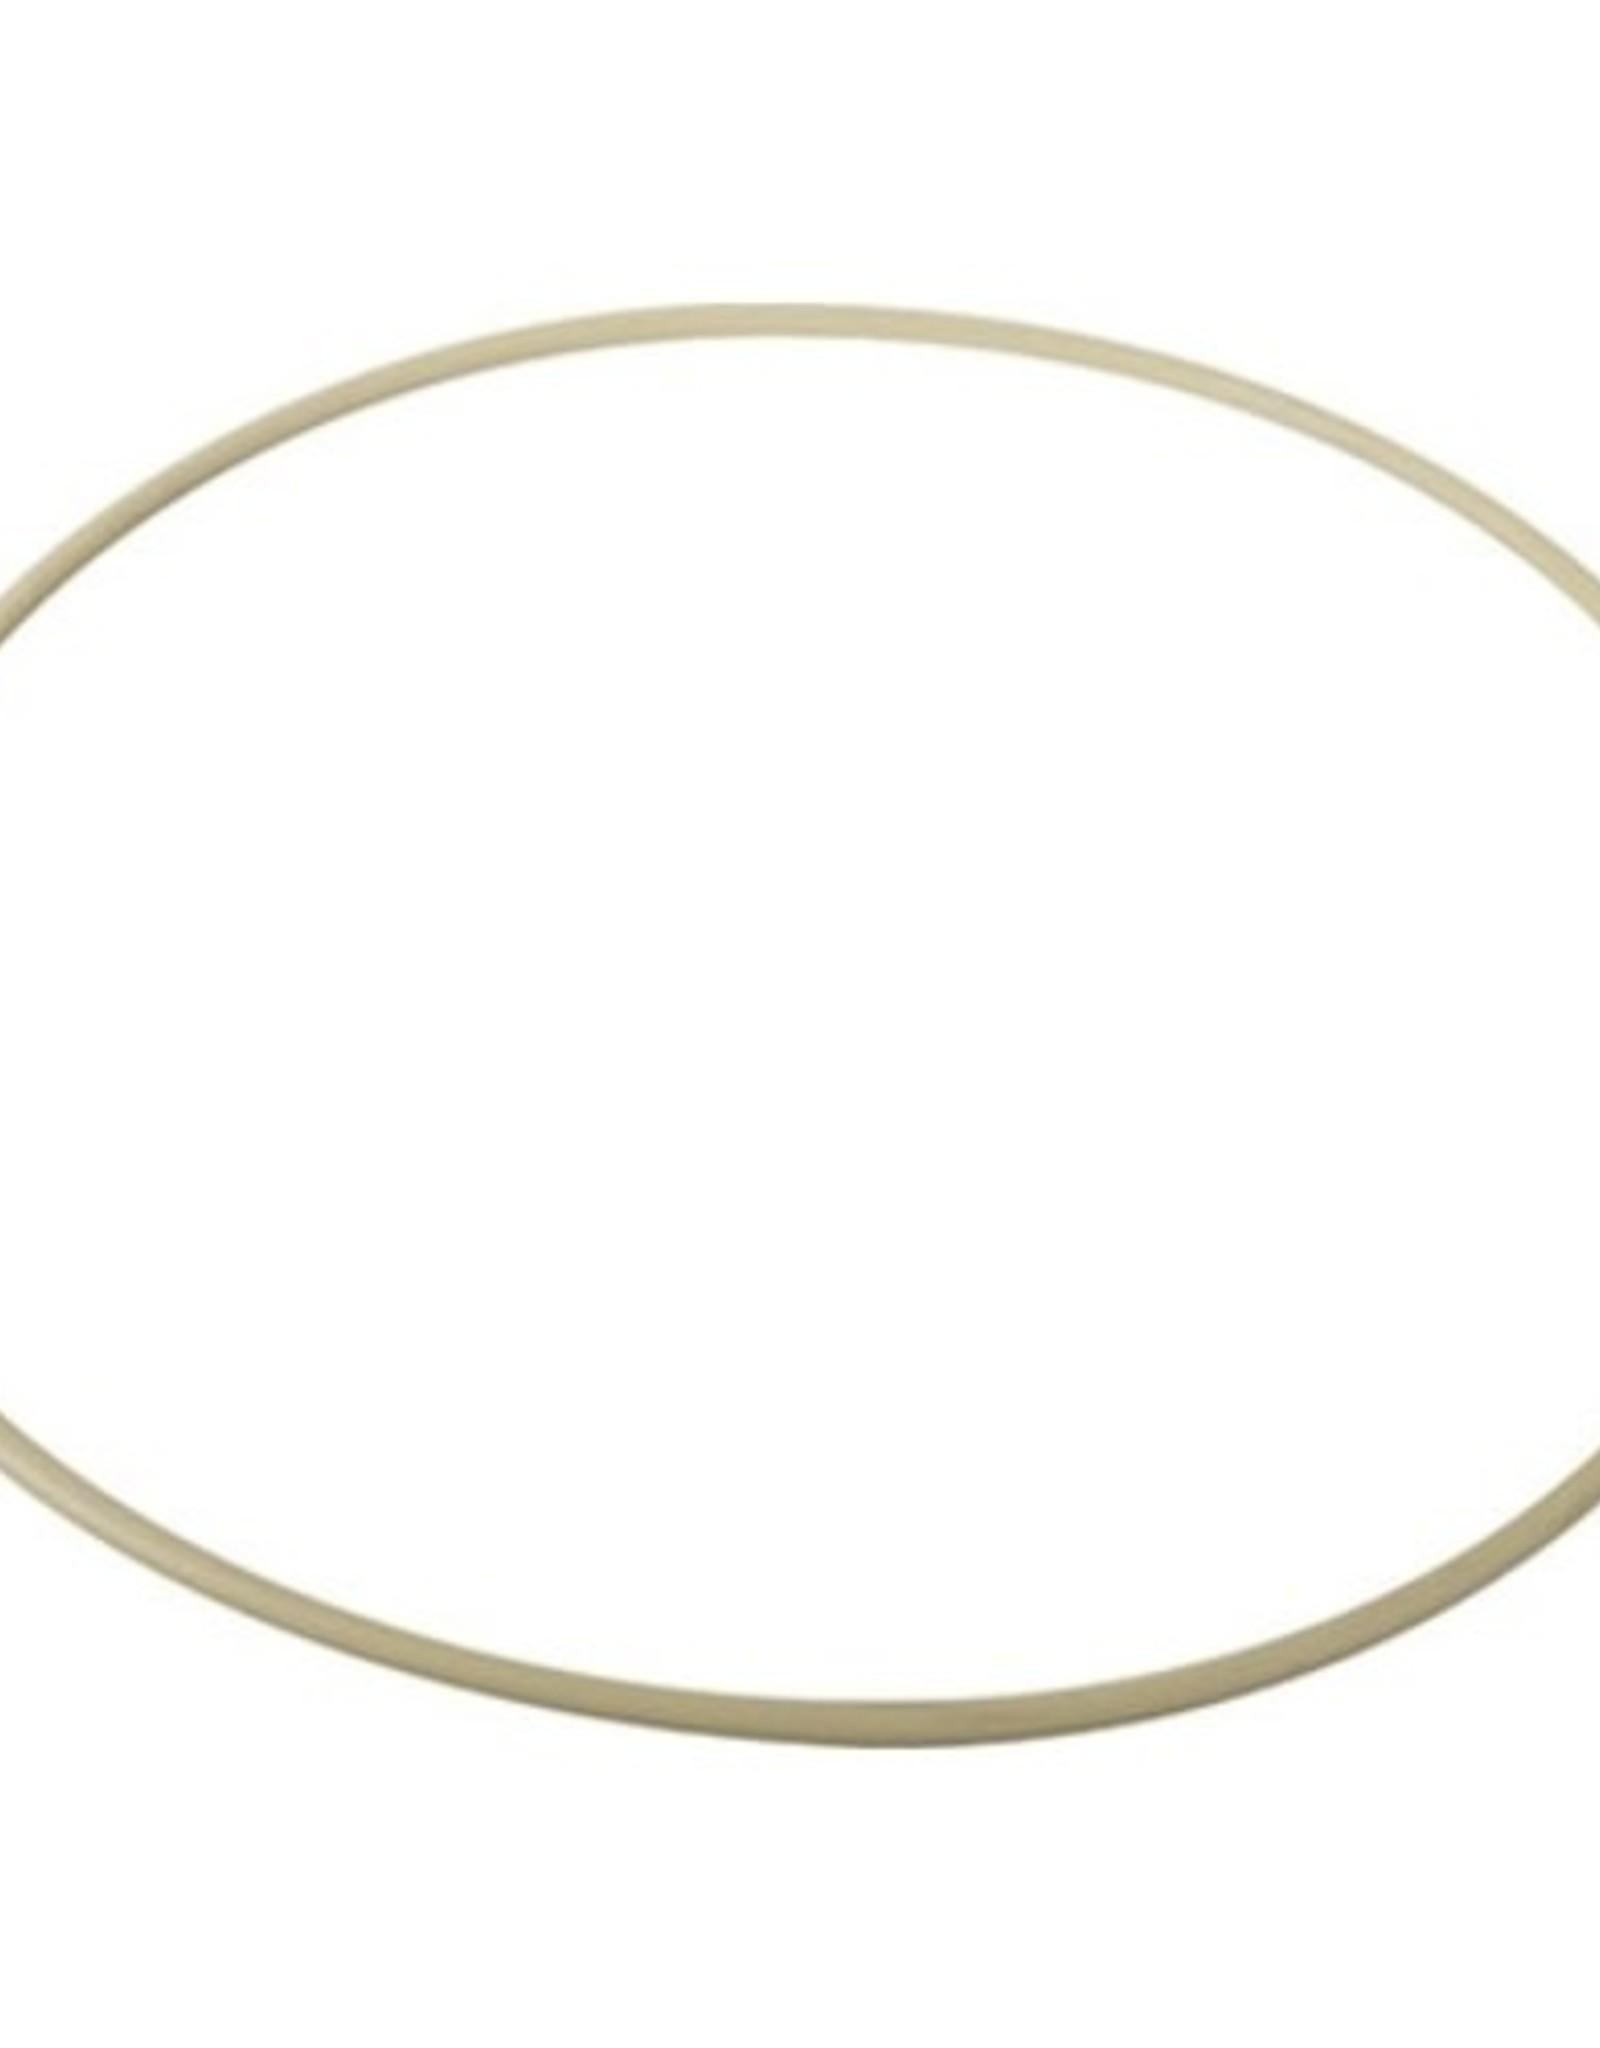 SPEIDEL Replacement Lid Gasket For Speidel Plastic Fermenter - 15.9 gal. & 31.7 gal.